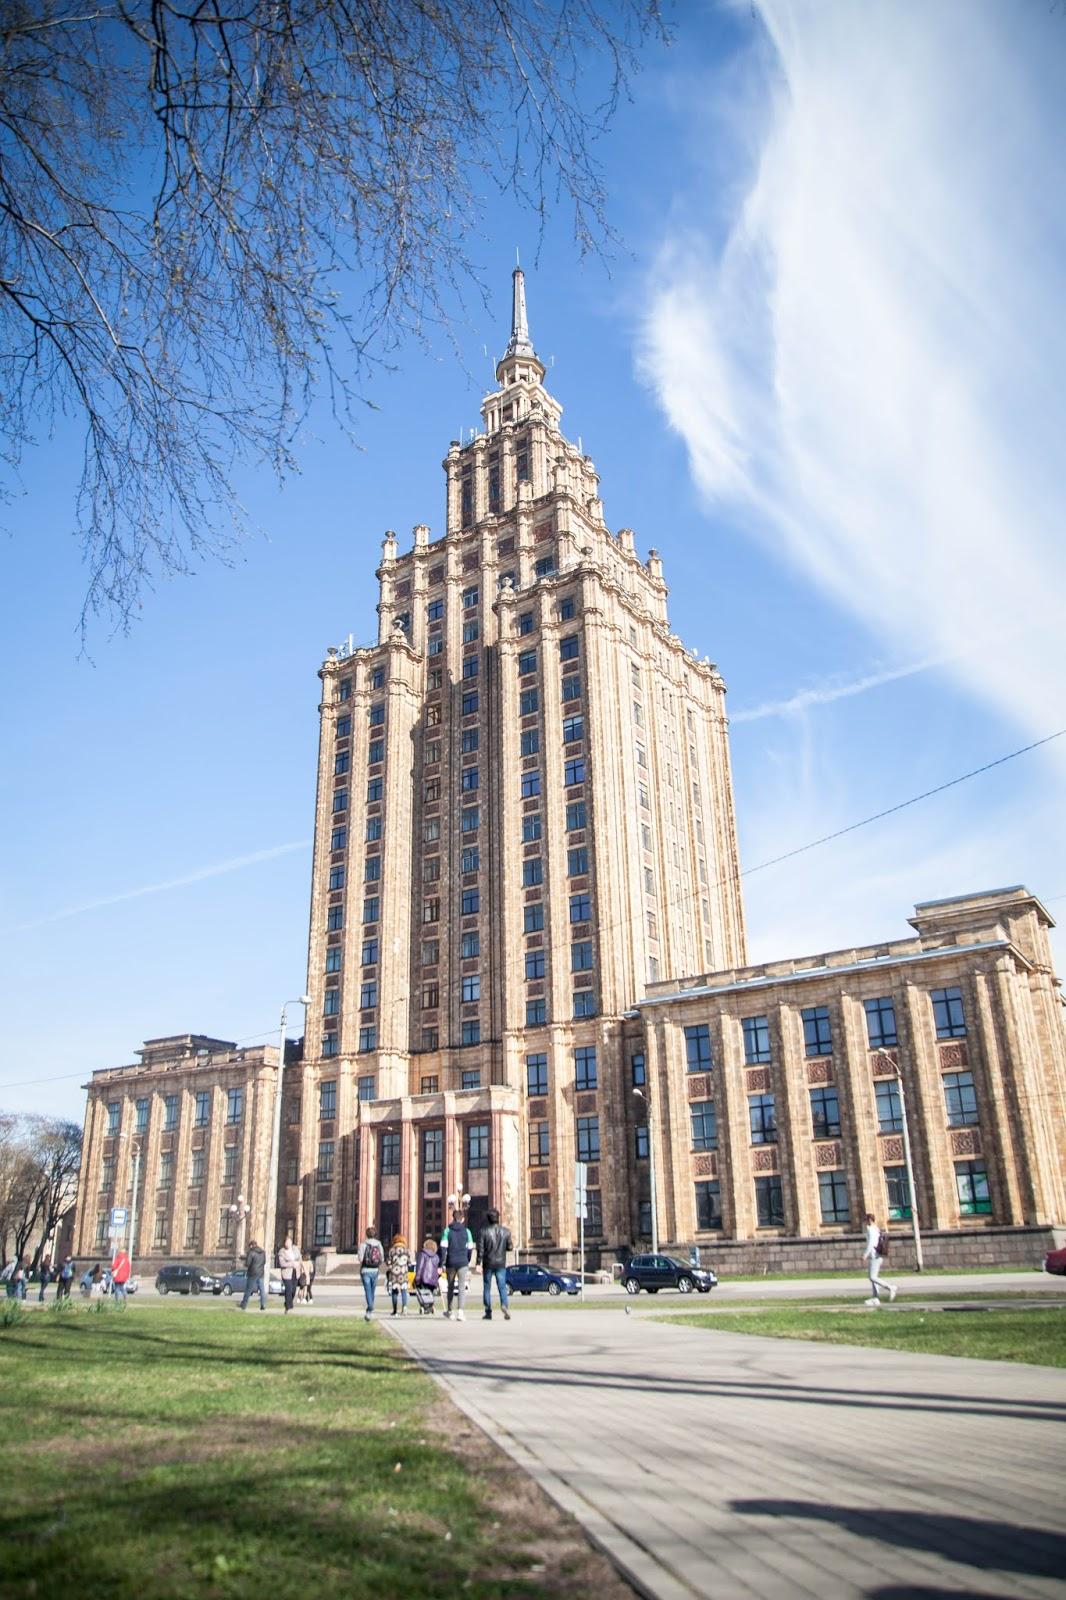 Tiedeakatemia Scienceacademy Riga Riika